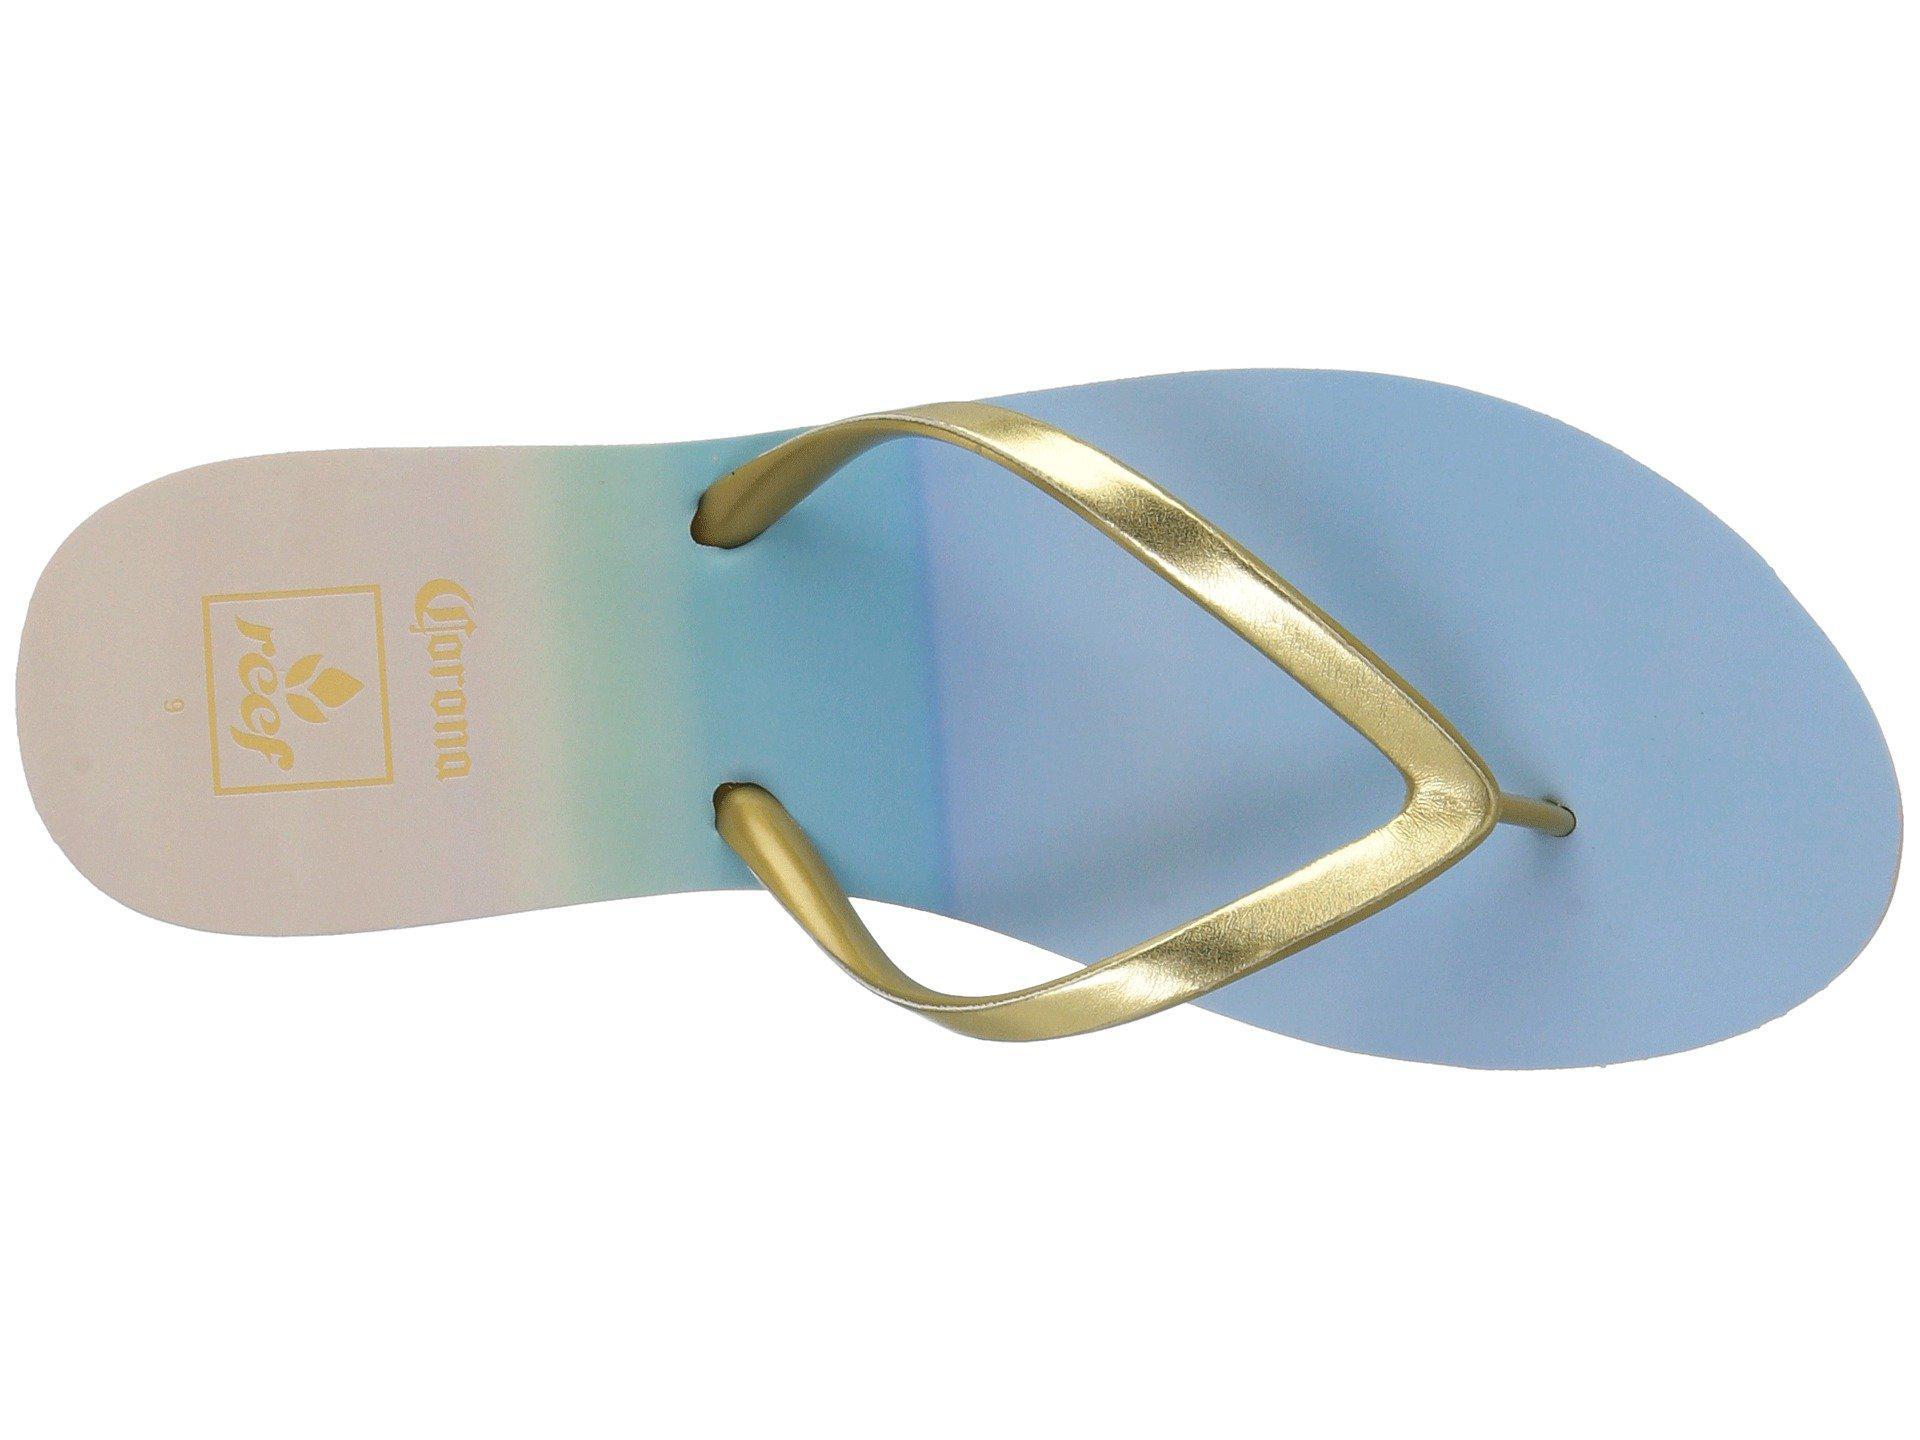 9a2134cd1560 Reef - Blue Stargazer X Corona (beach) Women s Sandals - Lyst. View  fullscreen